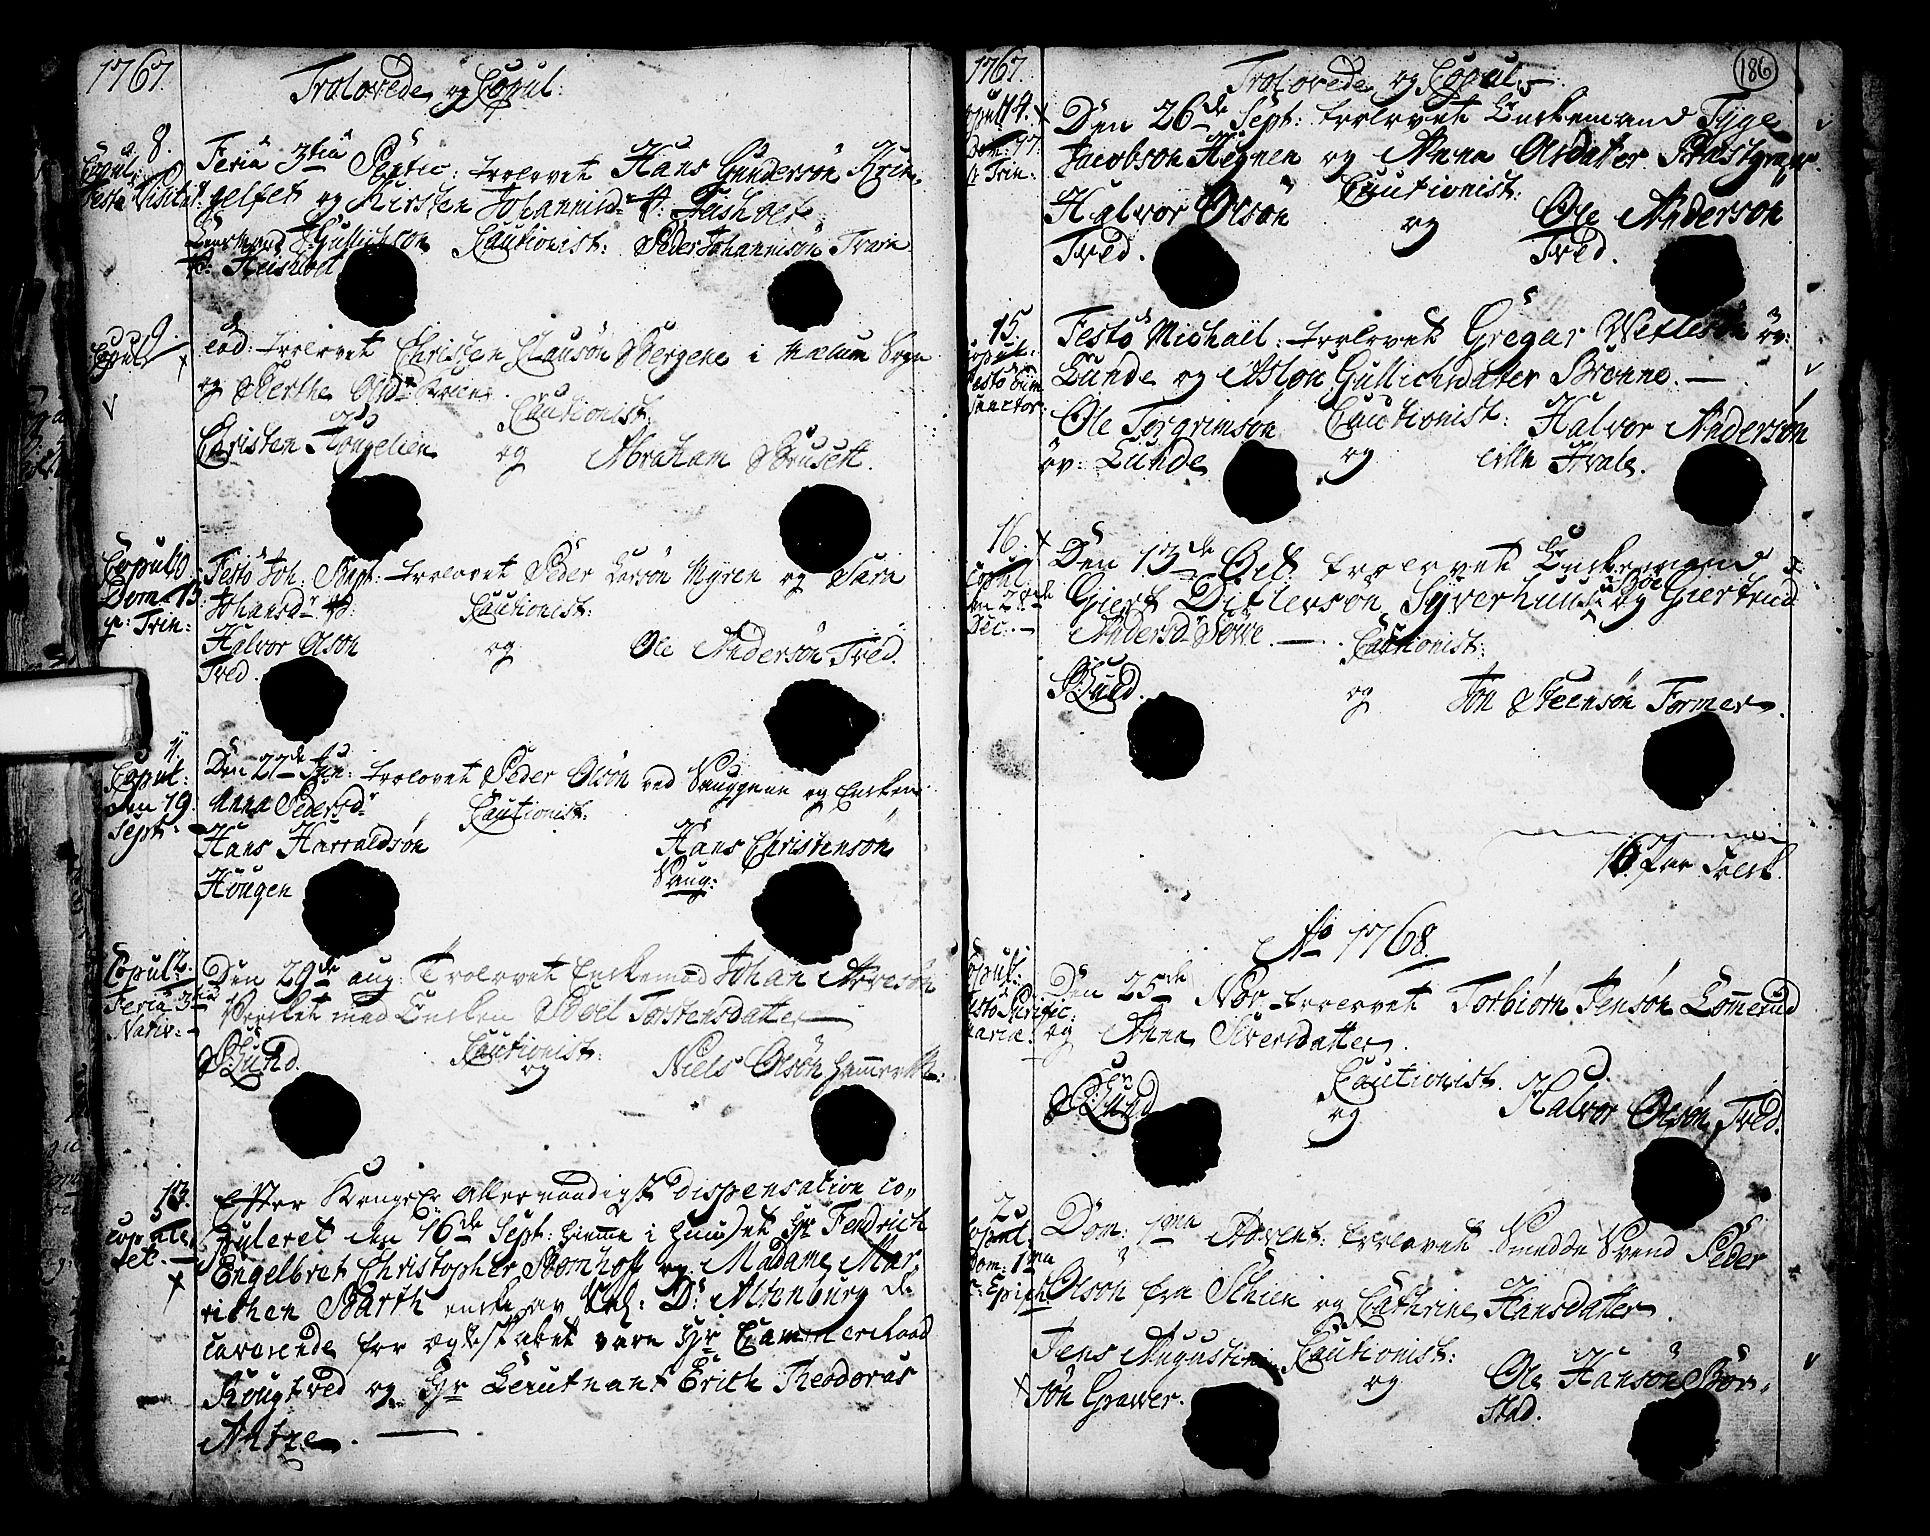 SAKO, Holla kirkebøker, F/Fa/L0001: Ministerialbok nr. 1, 1717-1779, s. 186